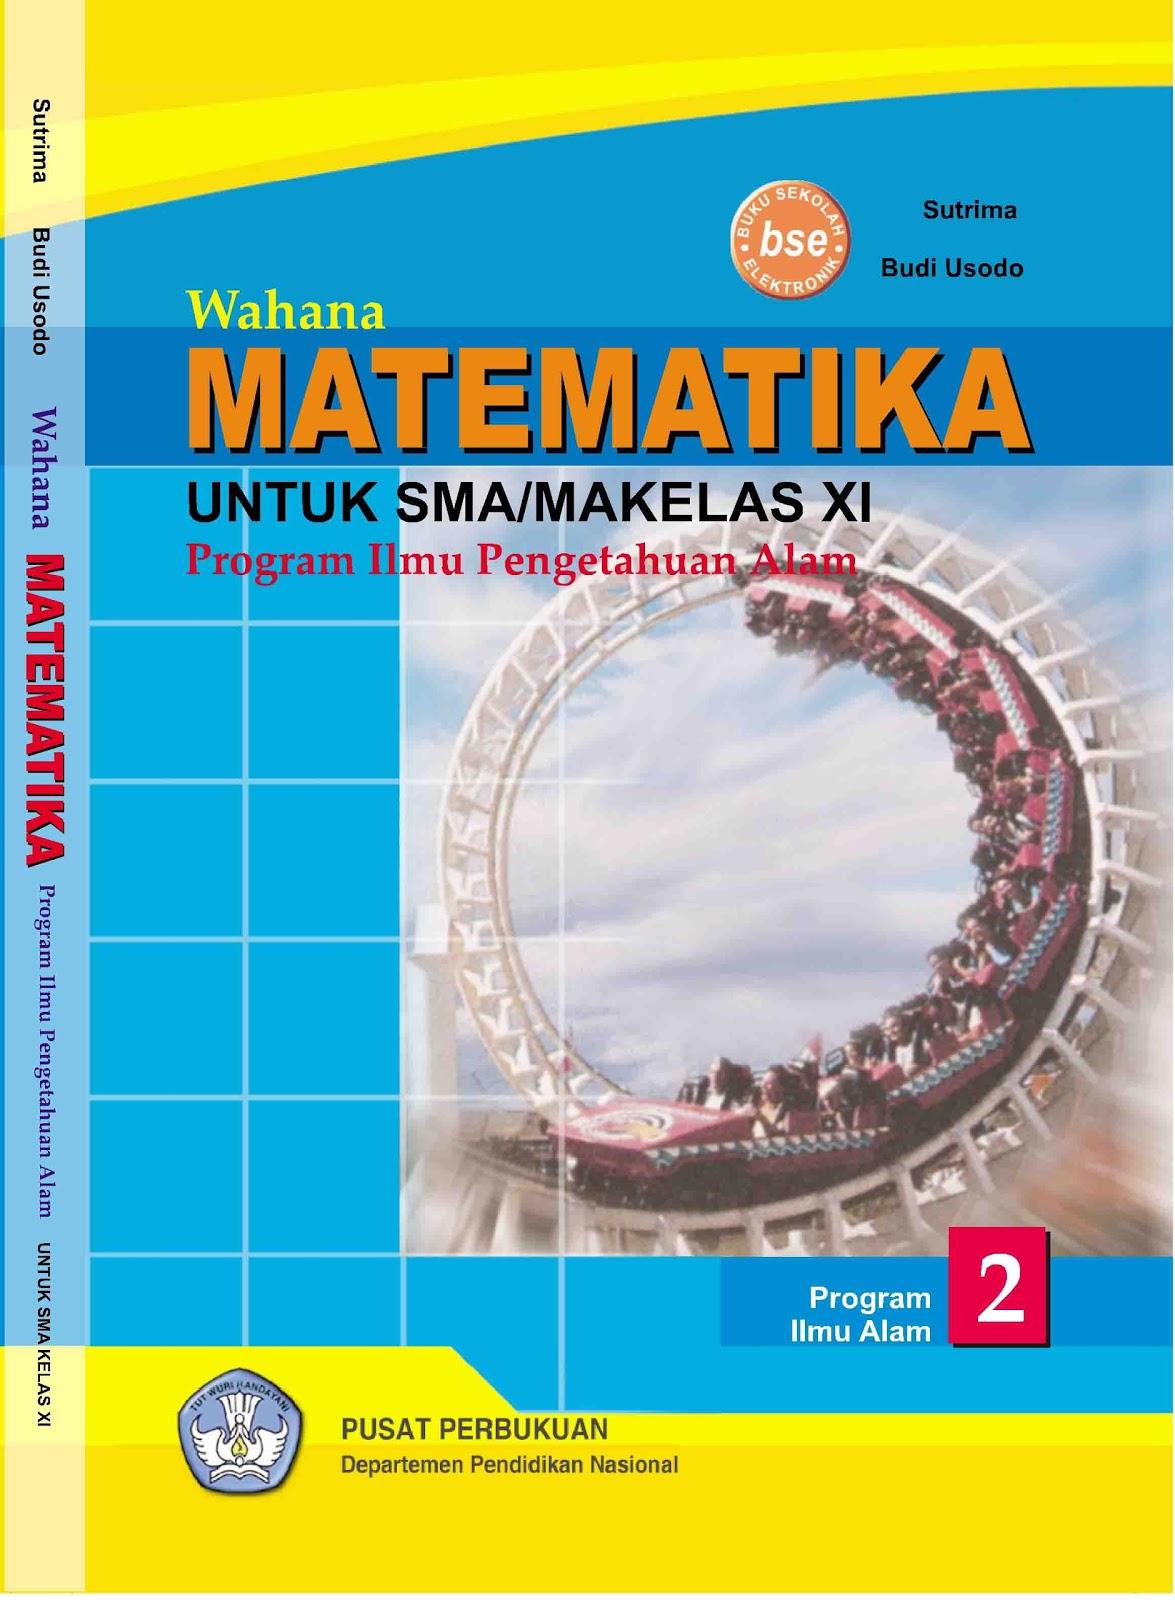 Buku Olimpiade Matematika Smp Gratis Postsshopperto Over Blog Com